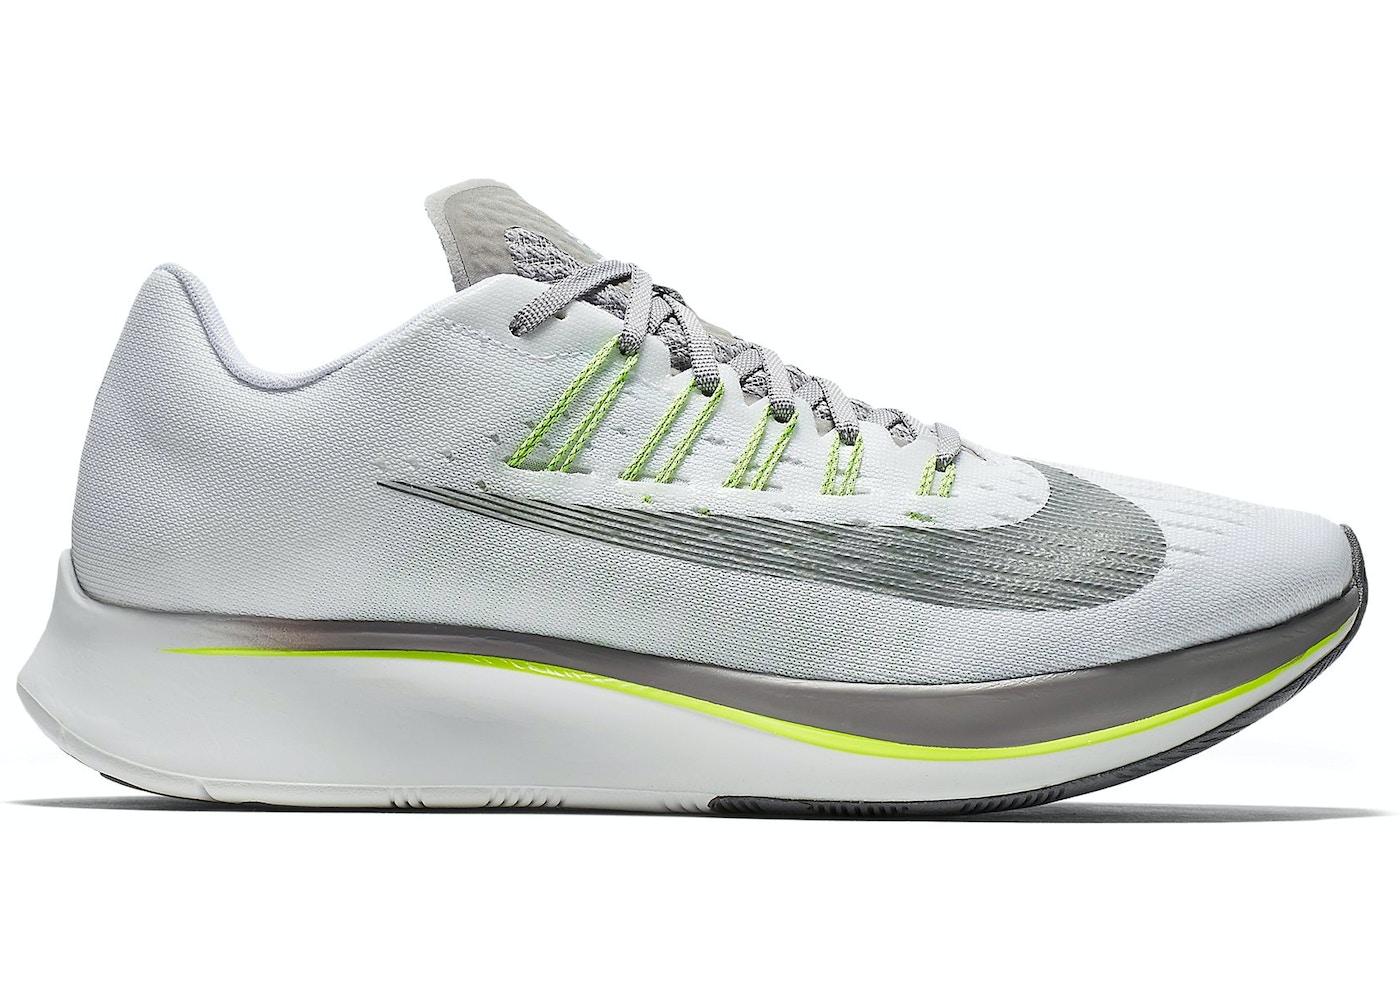 098f94fa42dd2 Nike Zoom Fly SP White Atmosphere Grey Volt (W) - 880848-101